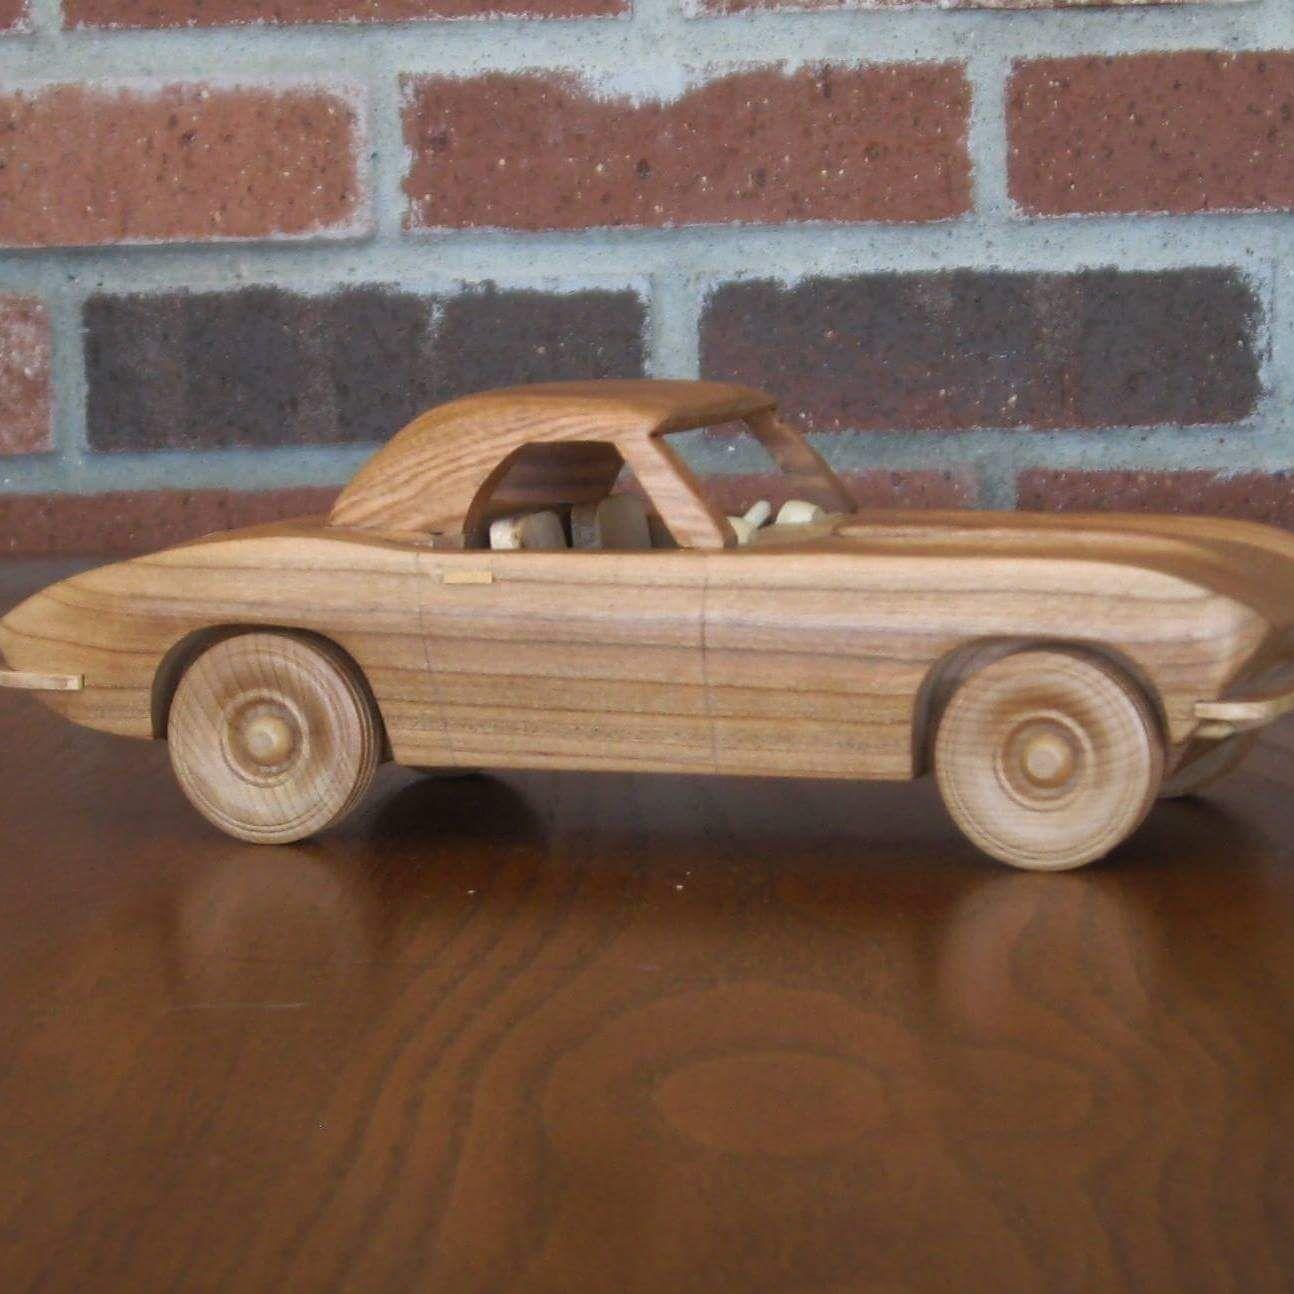 Pin By Balsa Manufaktur On Wooden Car Models References